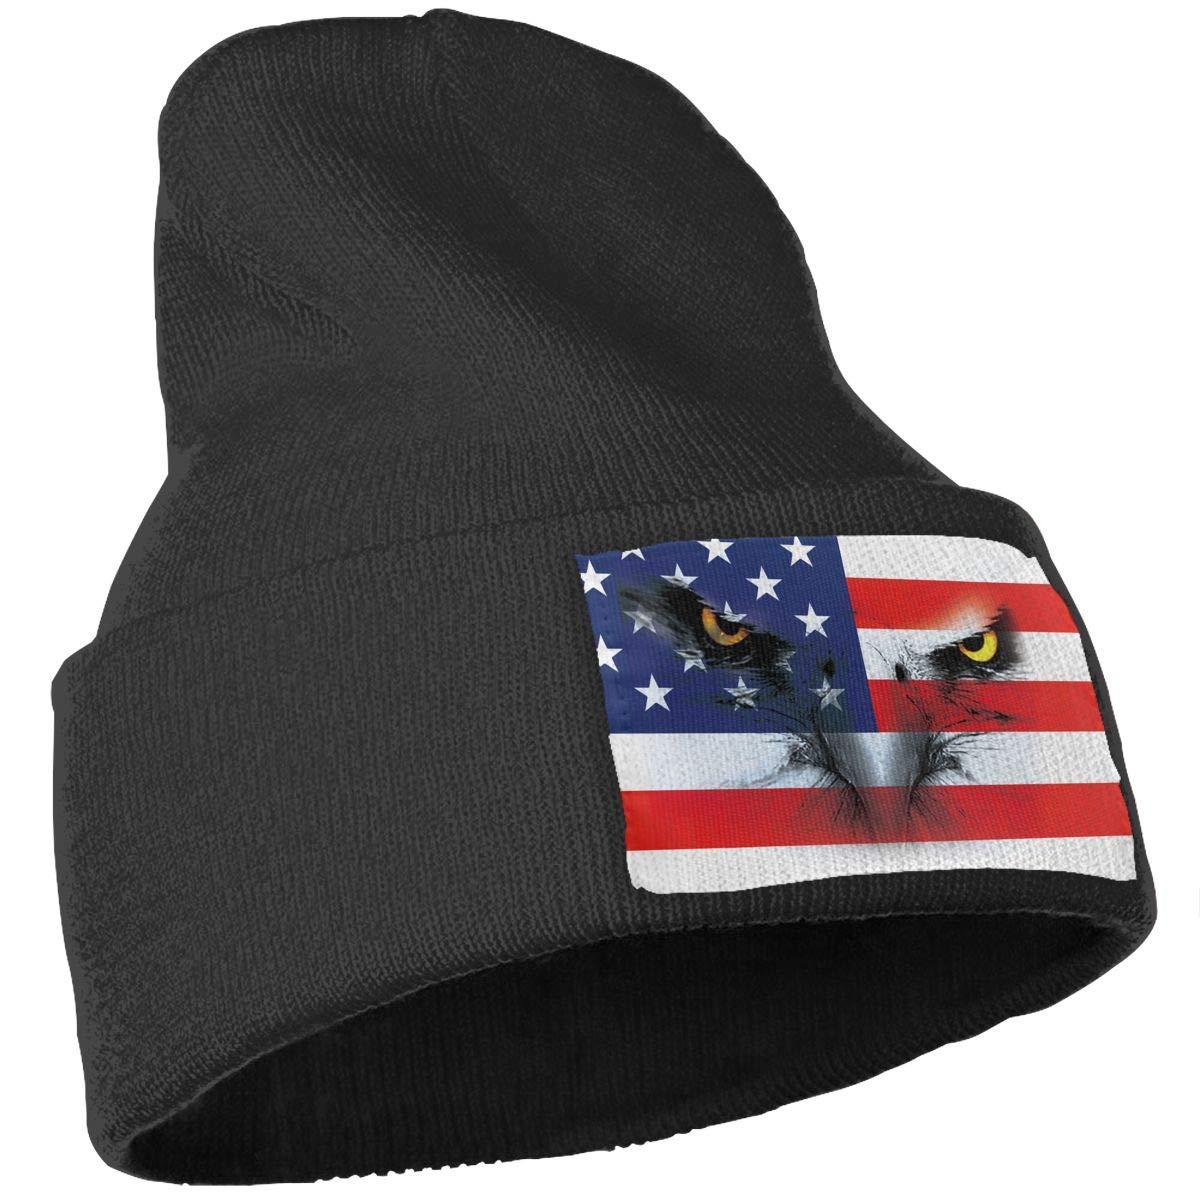 8cf0f9af2bff4 Amazon.com  American Eagle Winter Beanie Hat Soft   Warm Chunky Skull Wool Knit  Hats Cap for Men Women  Clothing